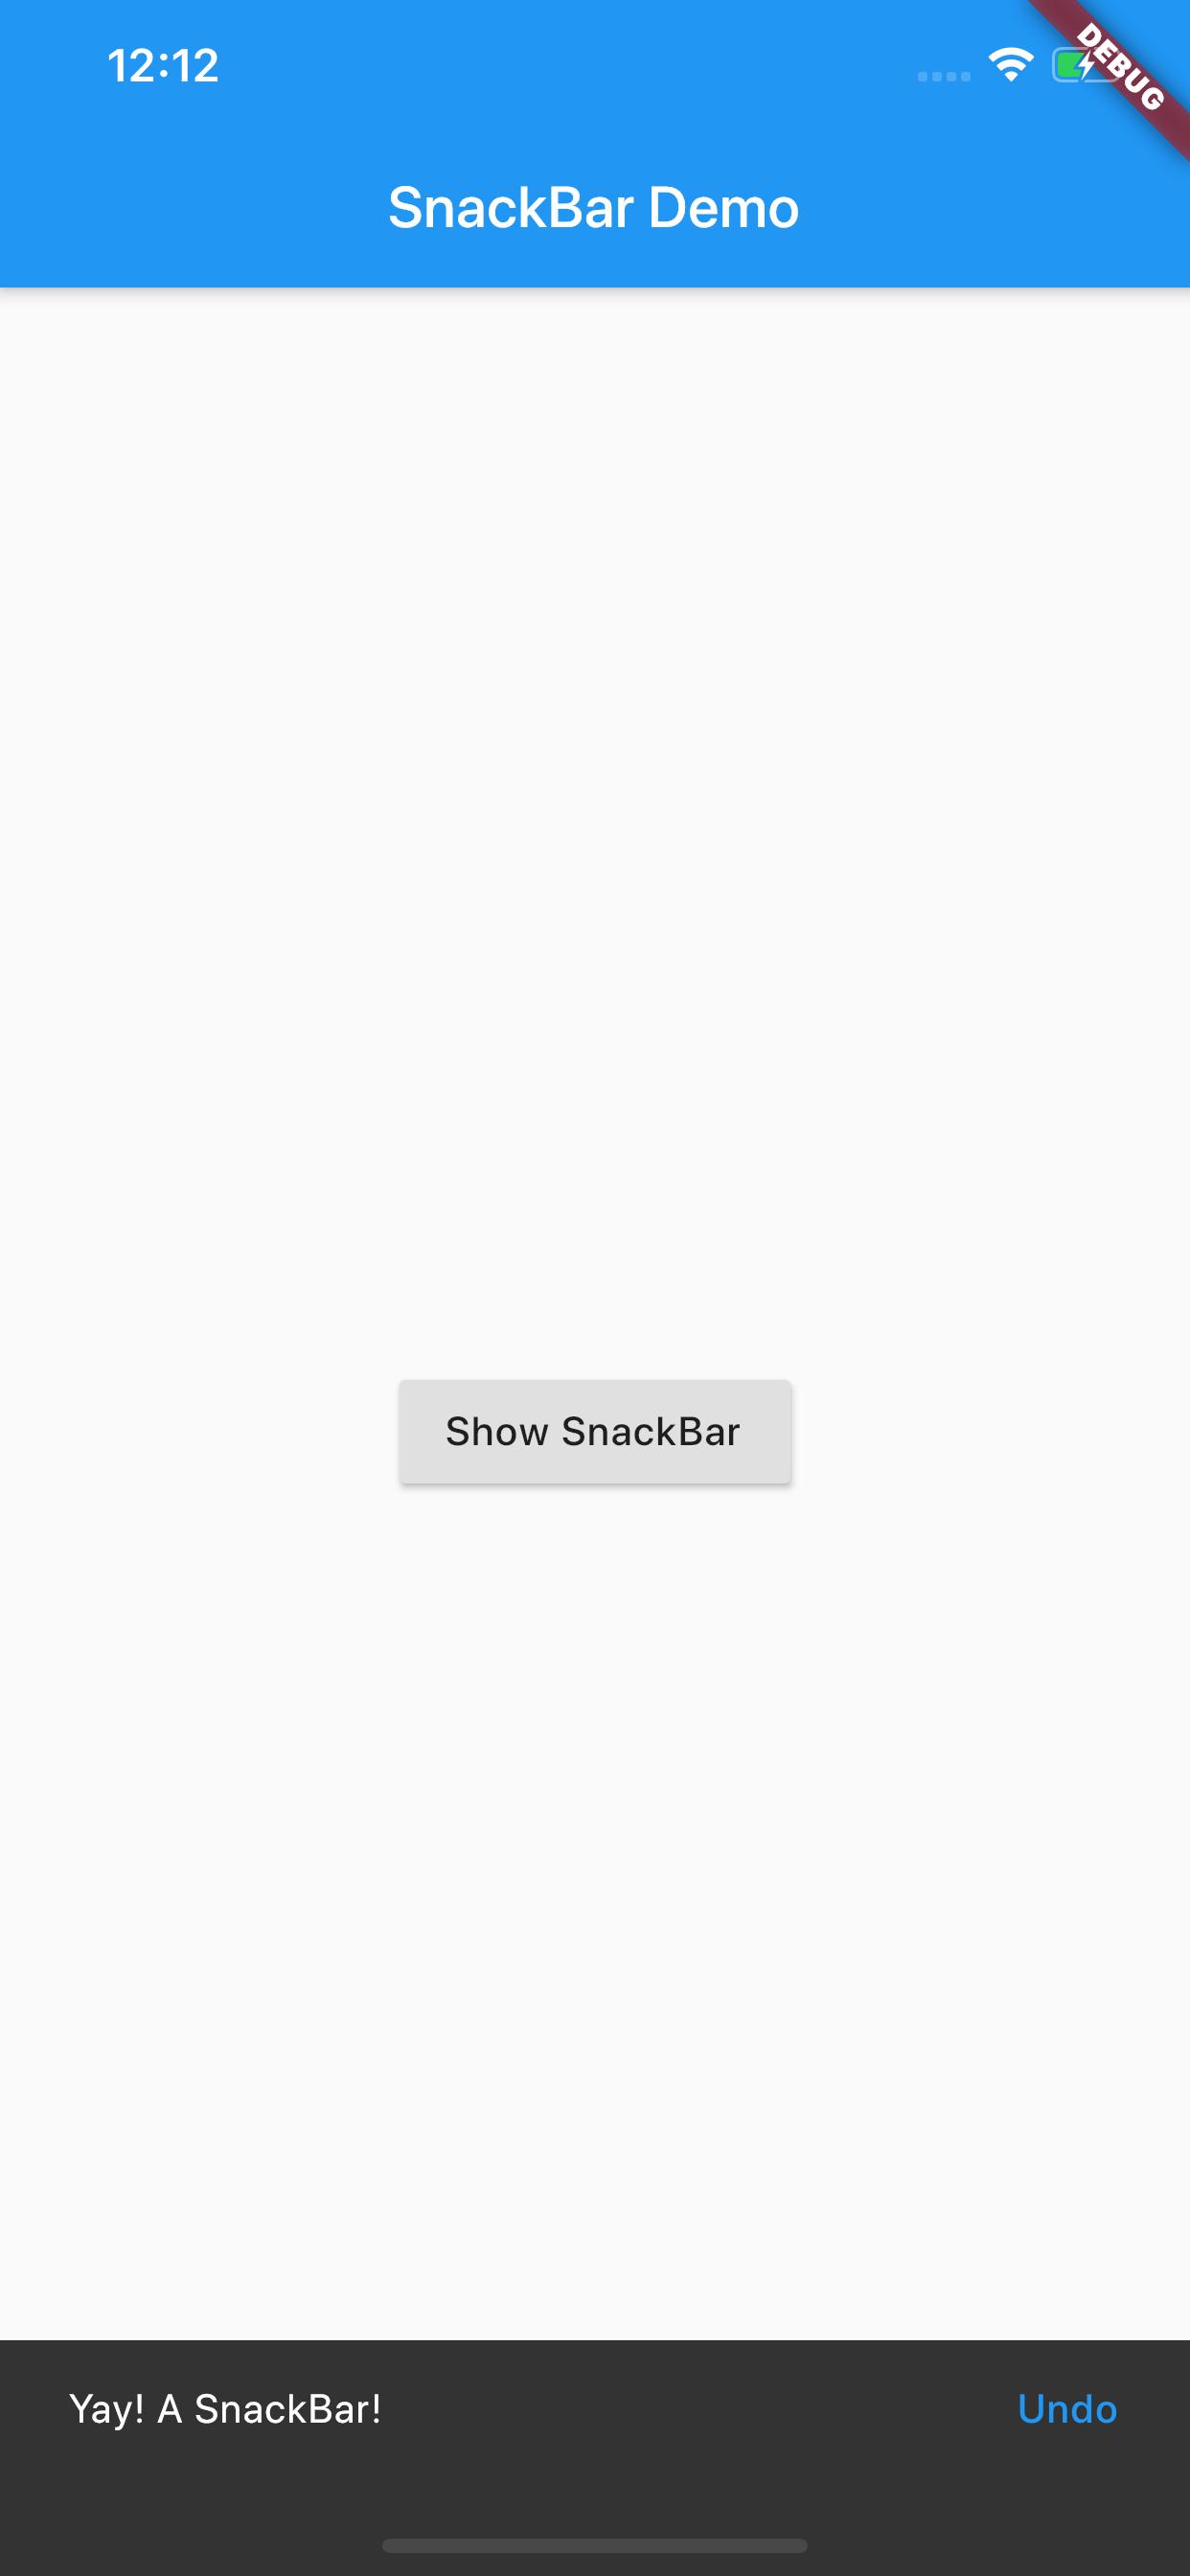 Simulator Screen Shot - iPhone 11 Pro Max - 2020-02-18 at 12.12.09.png